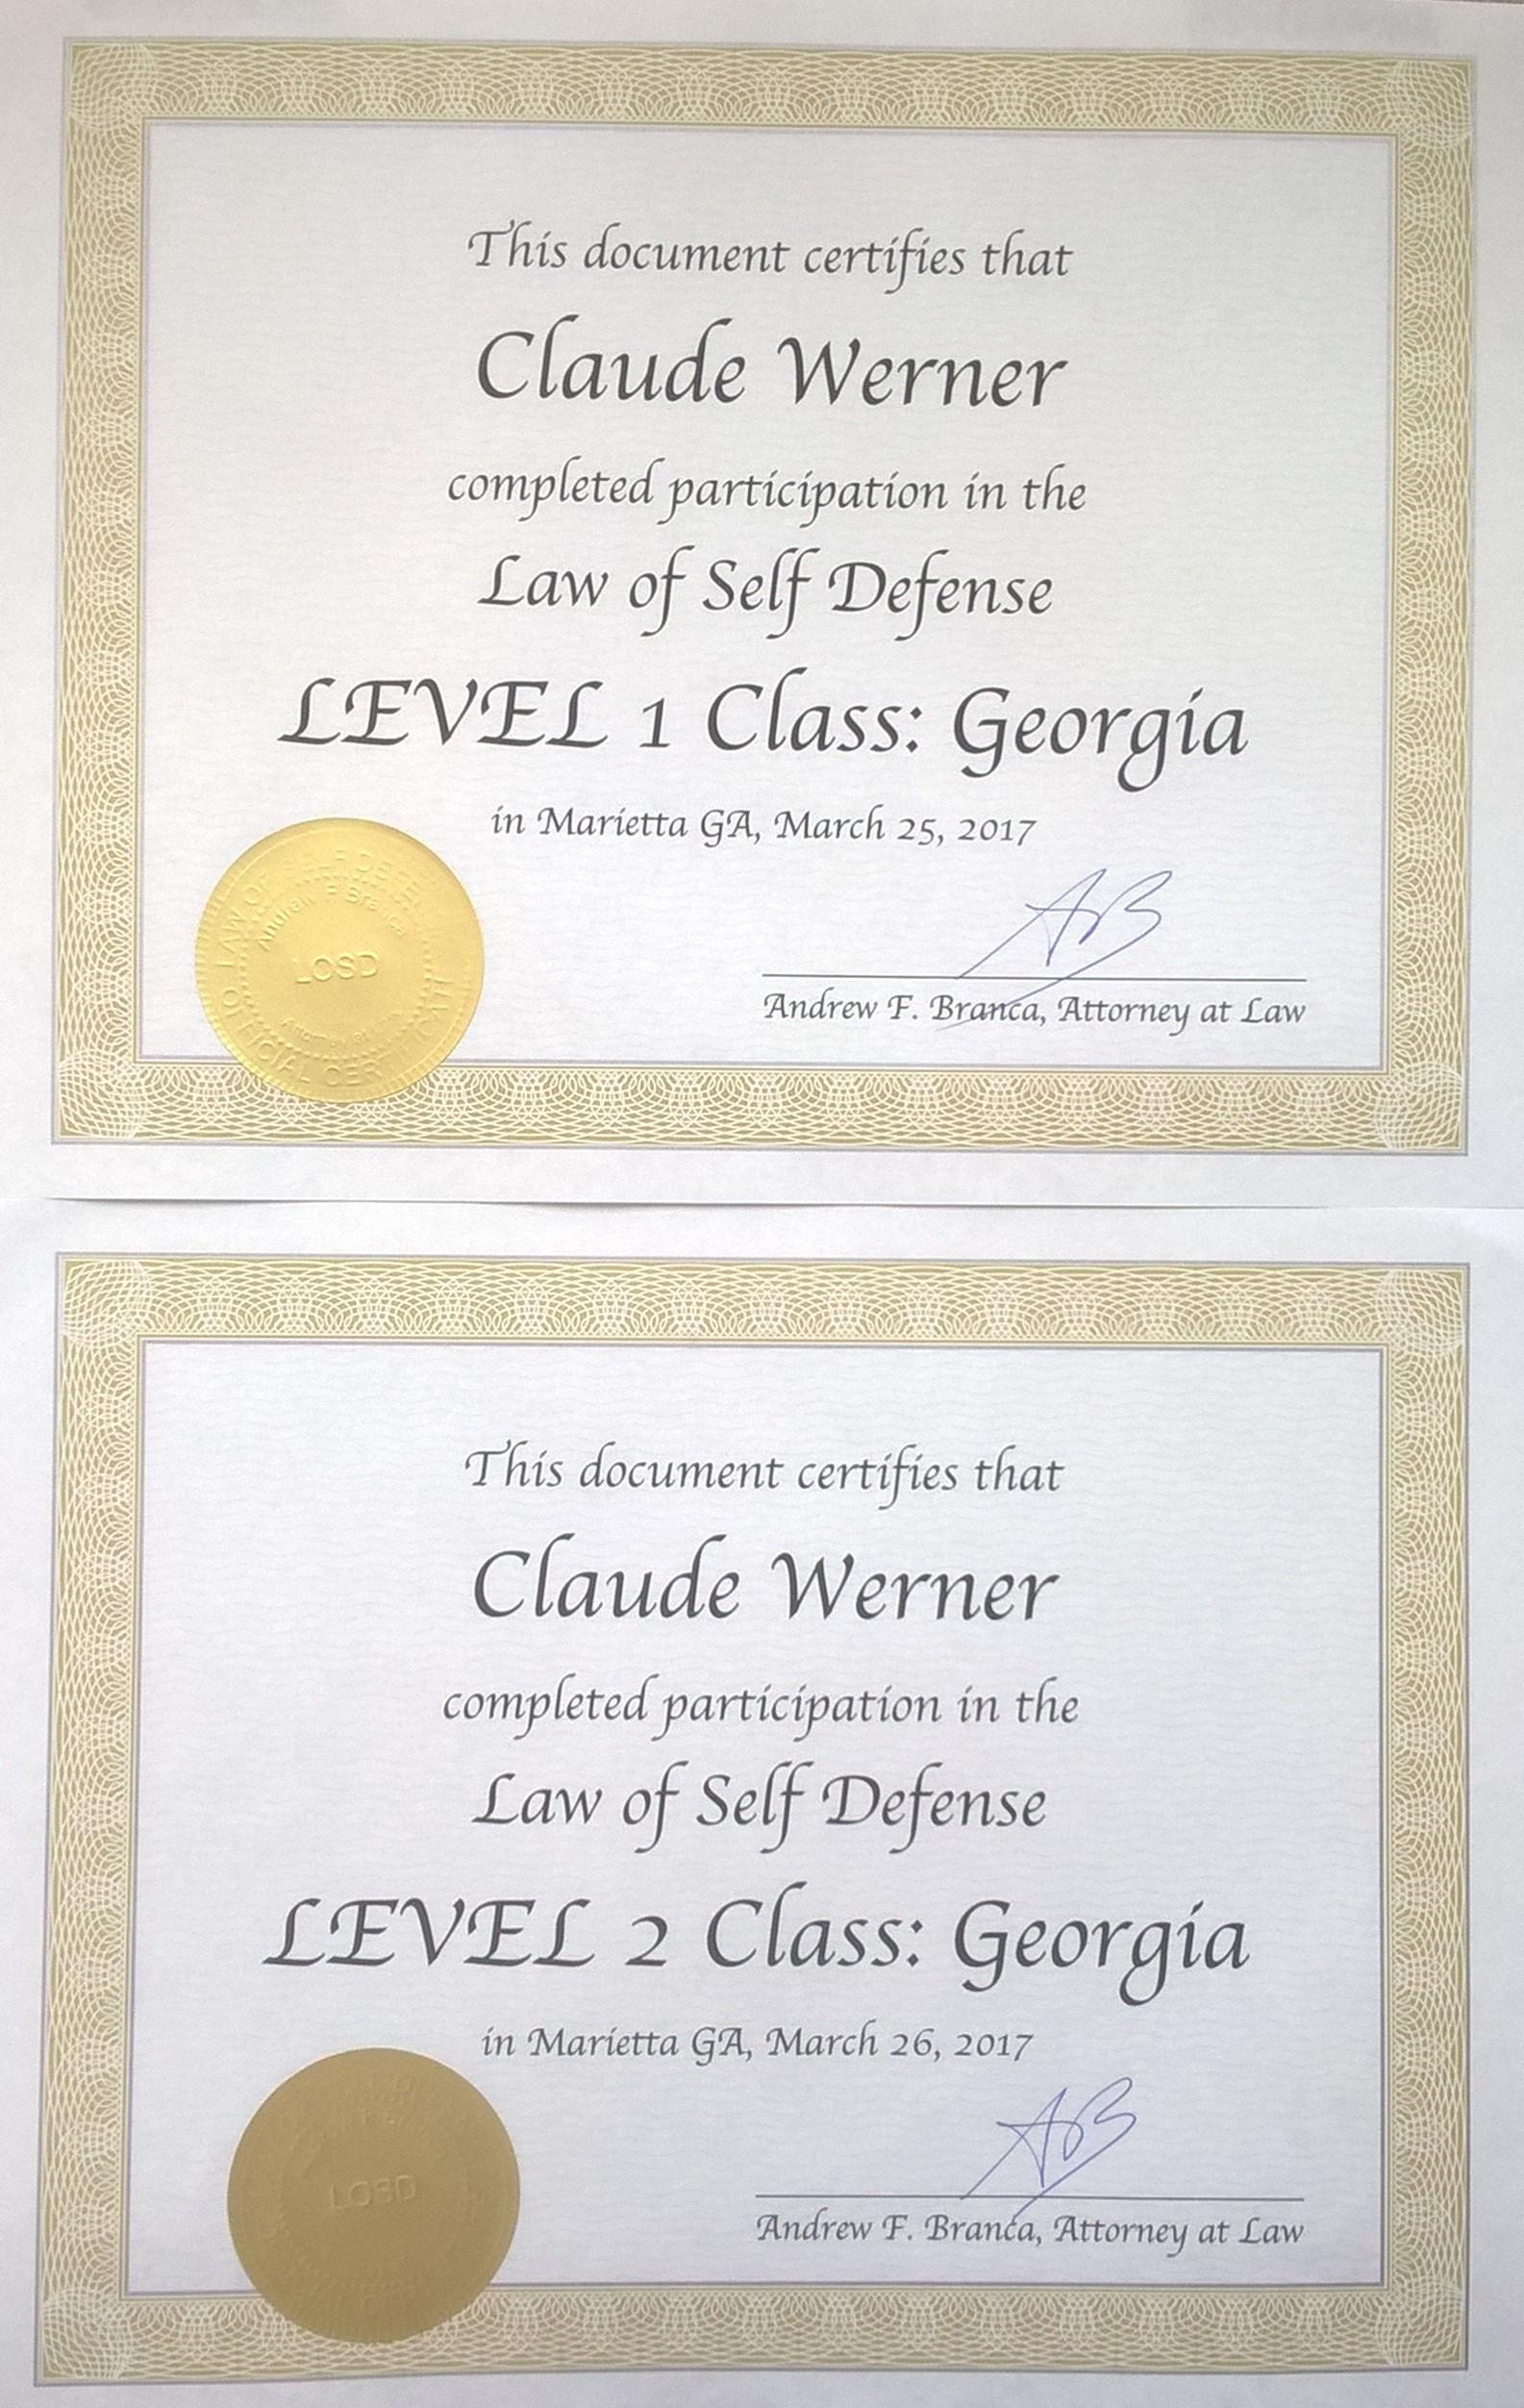 LOSD certificates